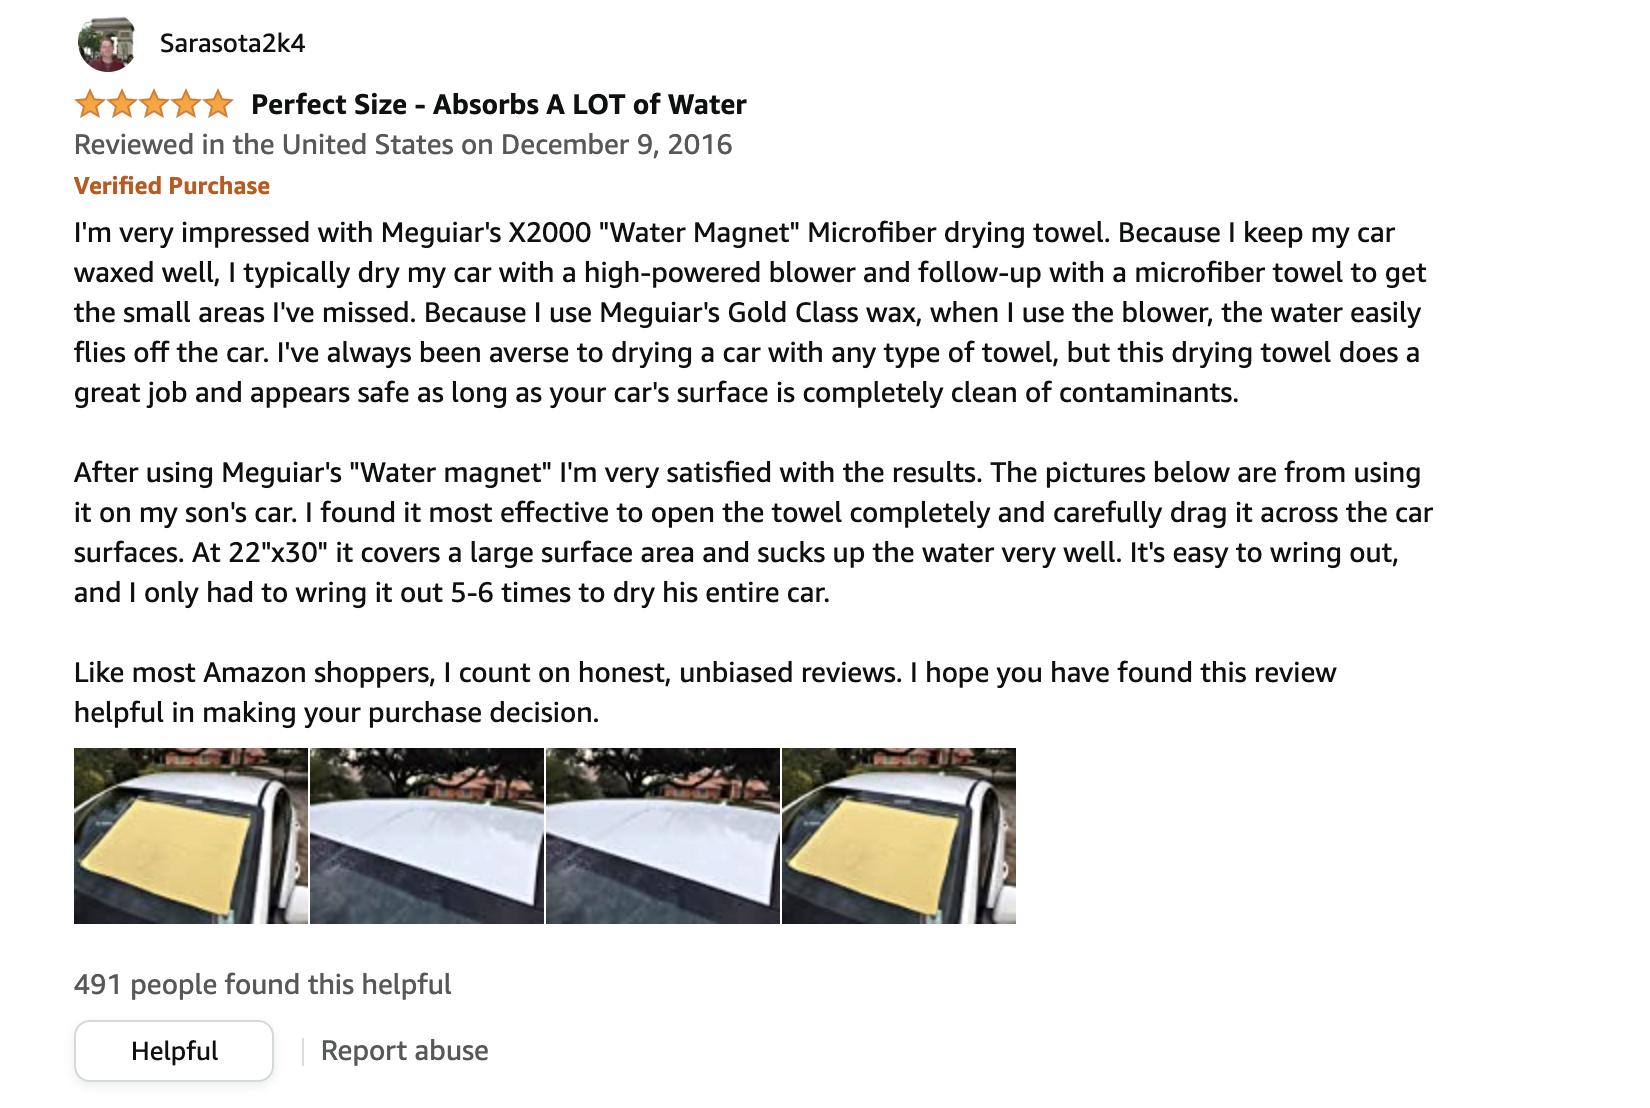 meguiar's water magnet drying towel